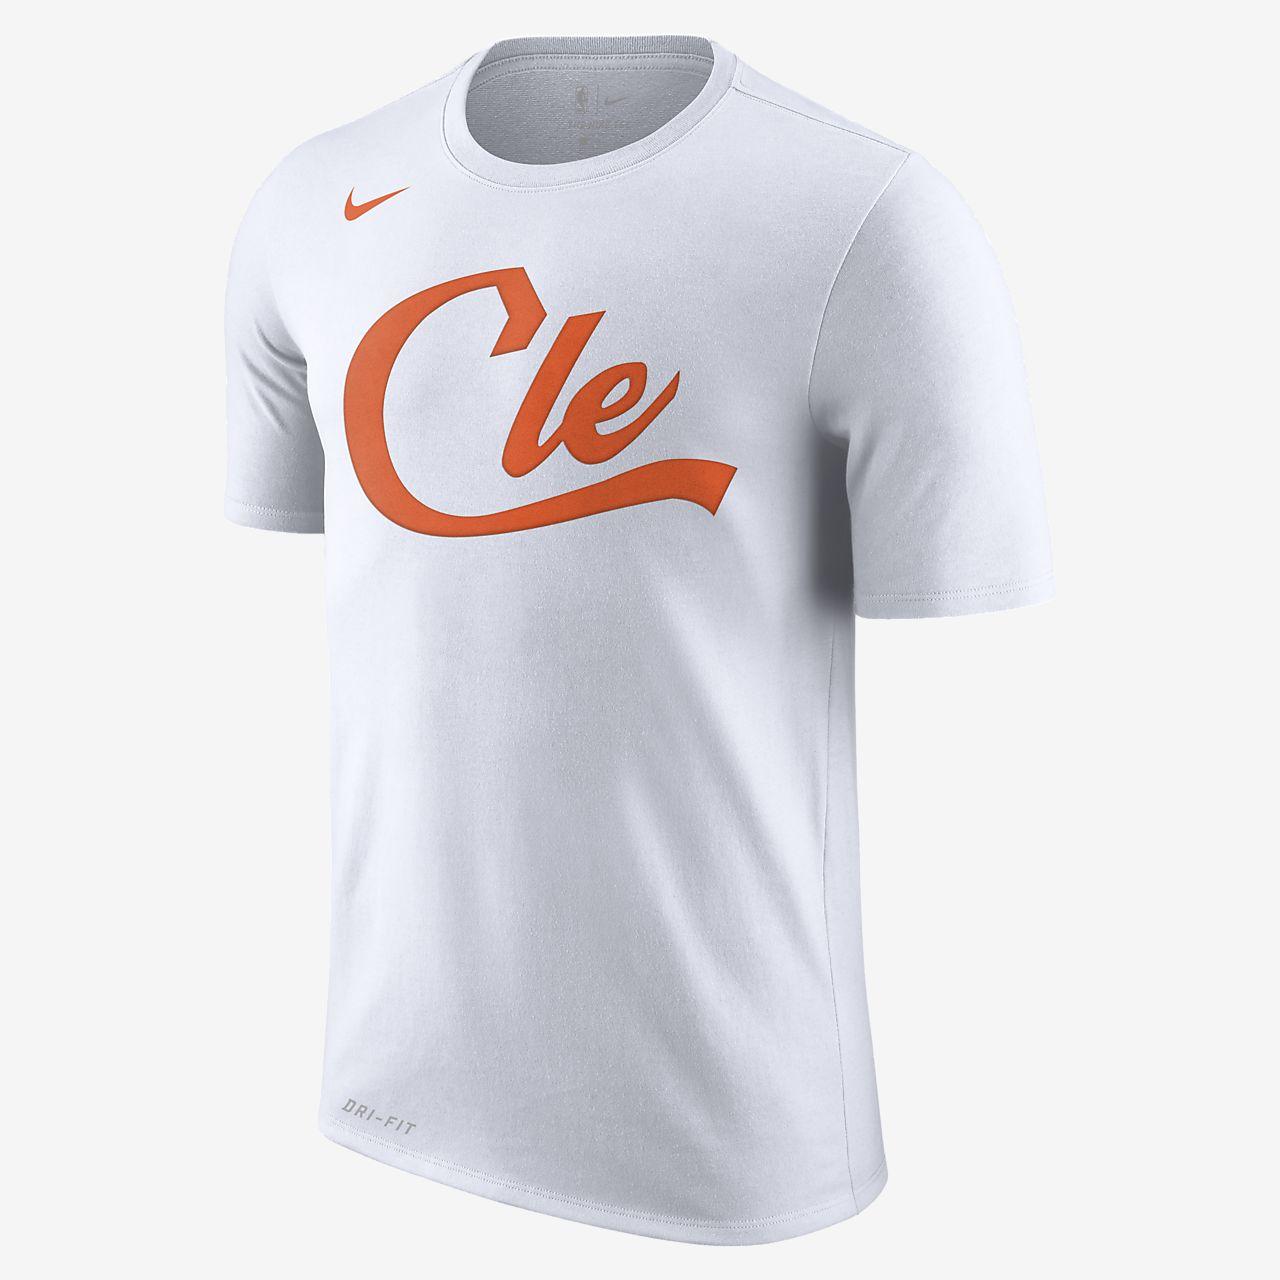 776bc7c65ea Cleveland Cavaliers City Edition Nike Dri-FIT Men s NBA T-Shirt ...